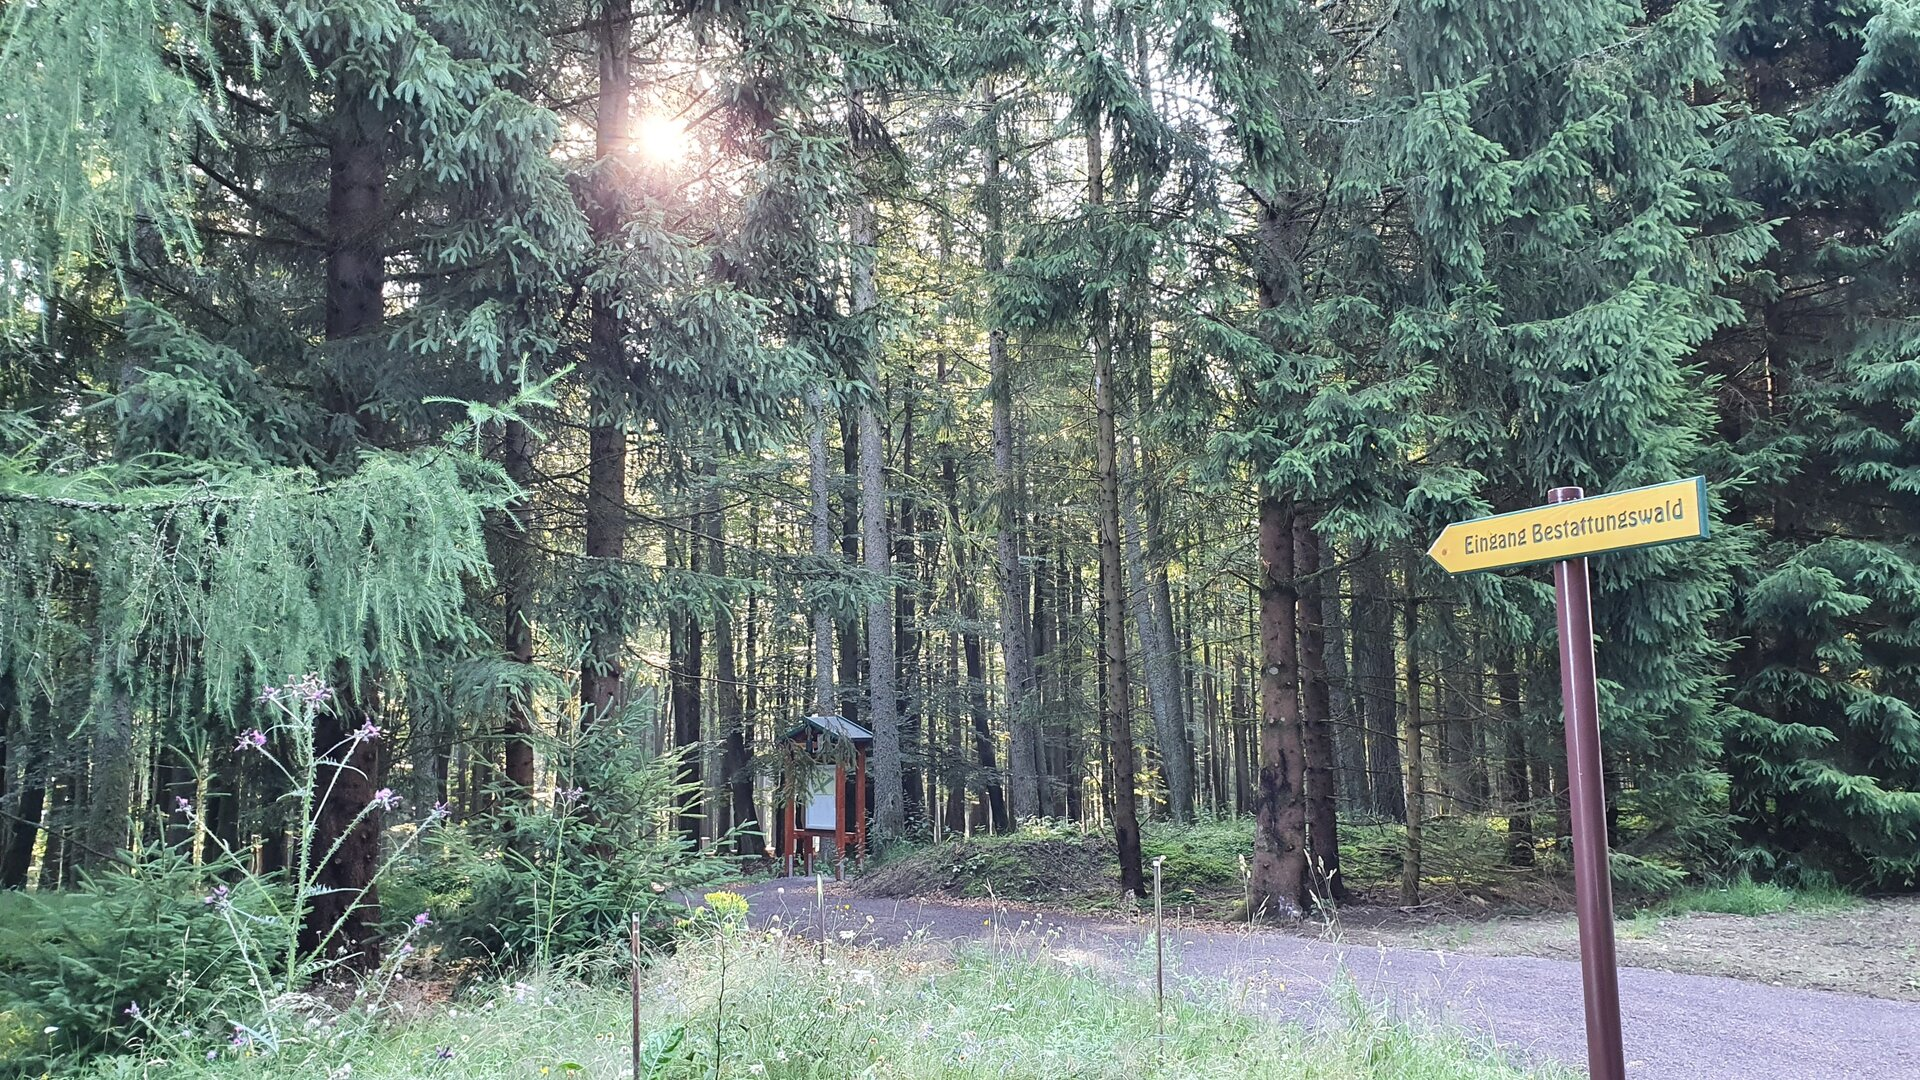 Hinweis am Eingang zum Bestattungswald